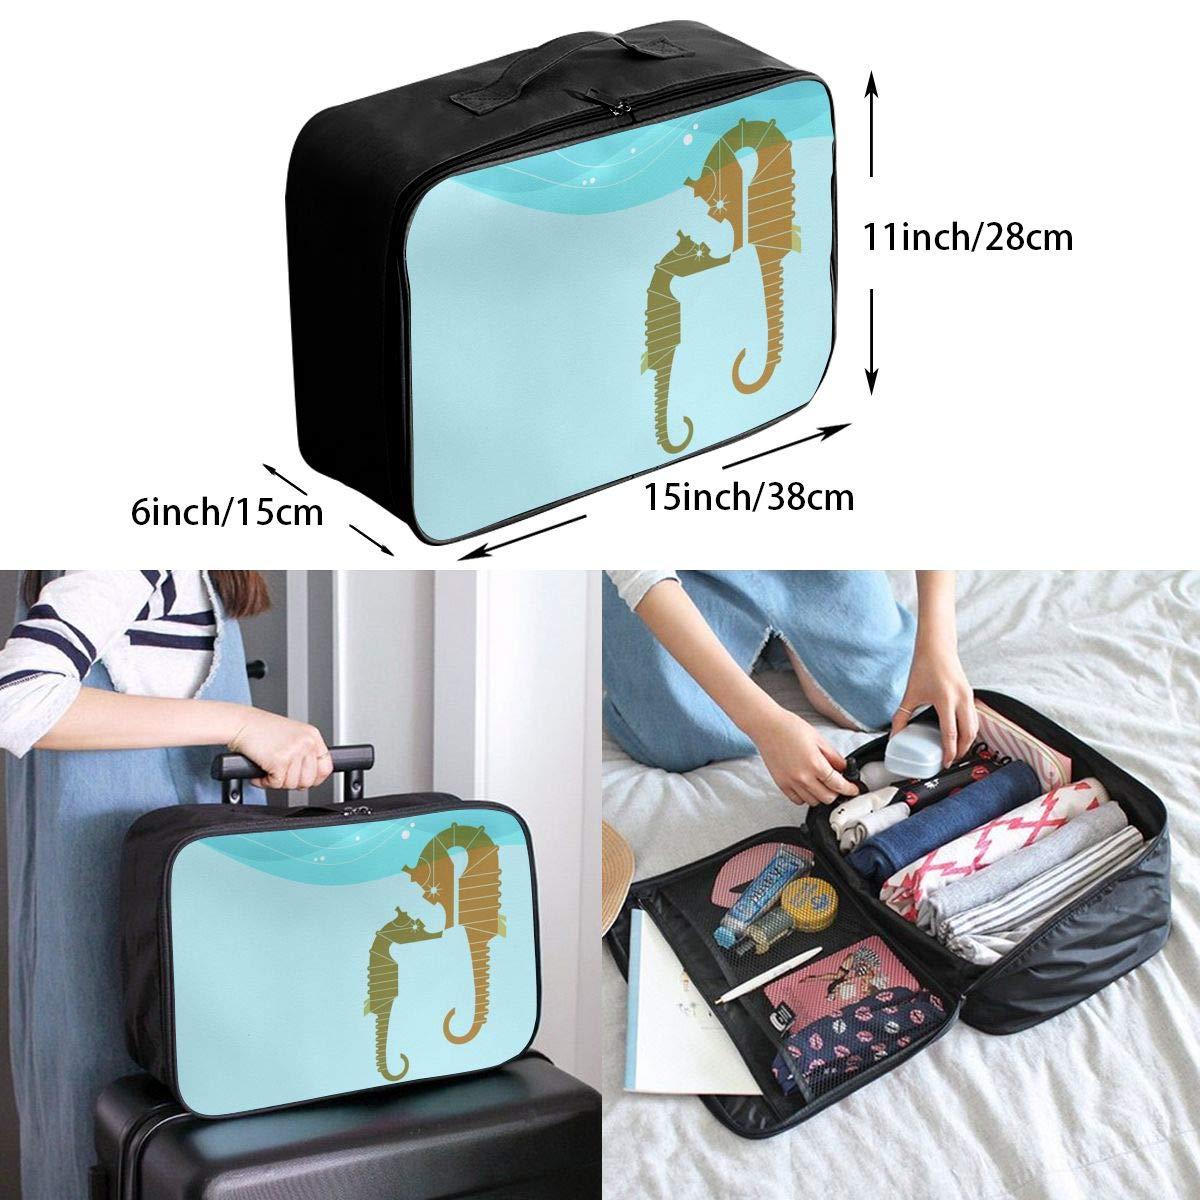 Travel Luggage Duffle Bag Lightweight Portable Handbag Sea Horse Large Capacity Waterproof Foldable Storage Tote